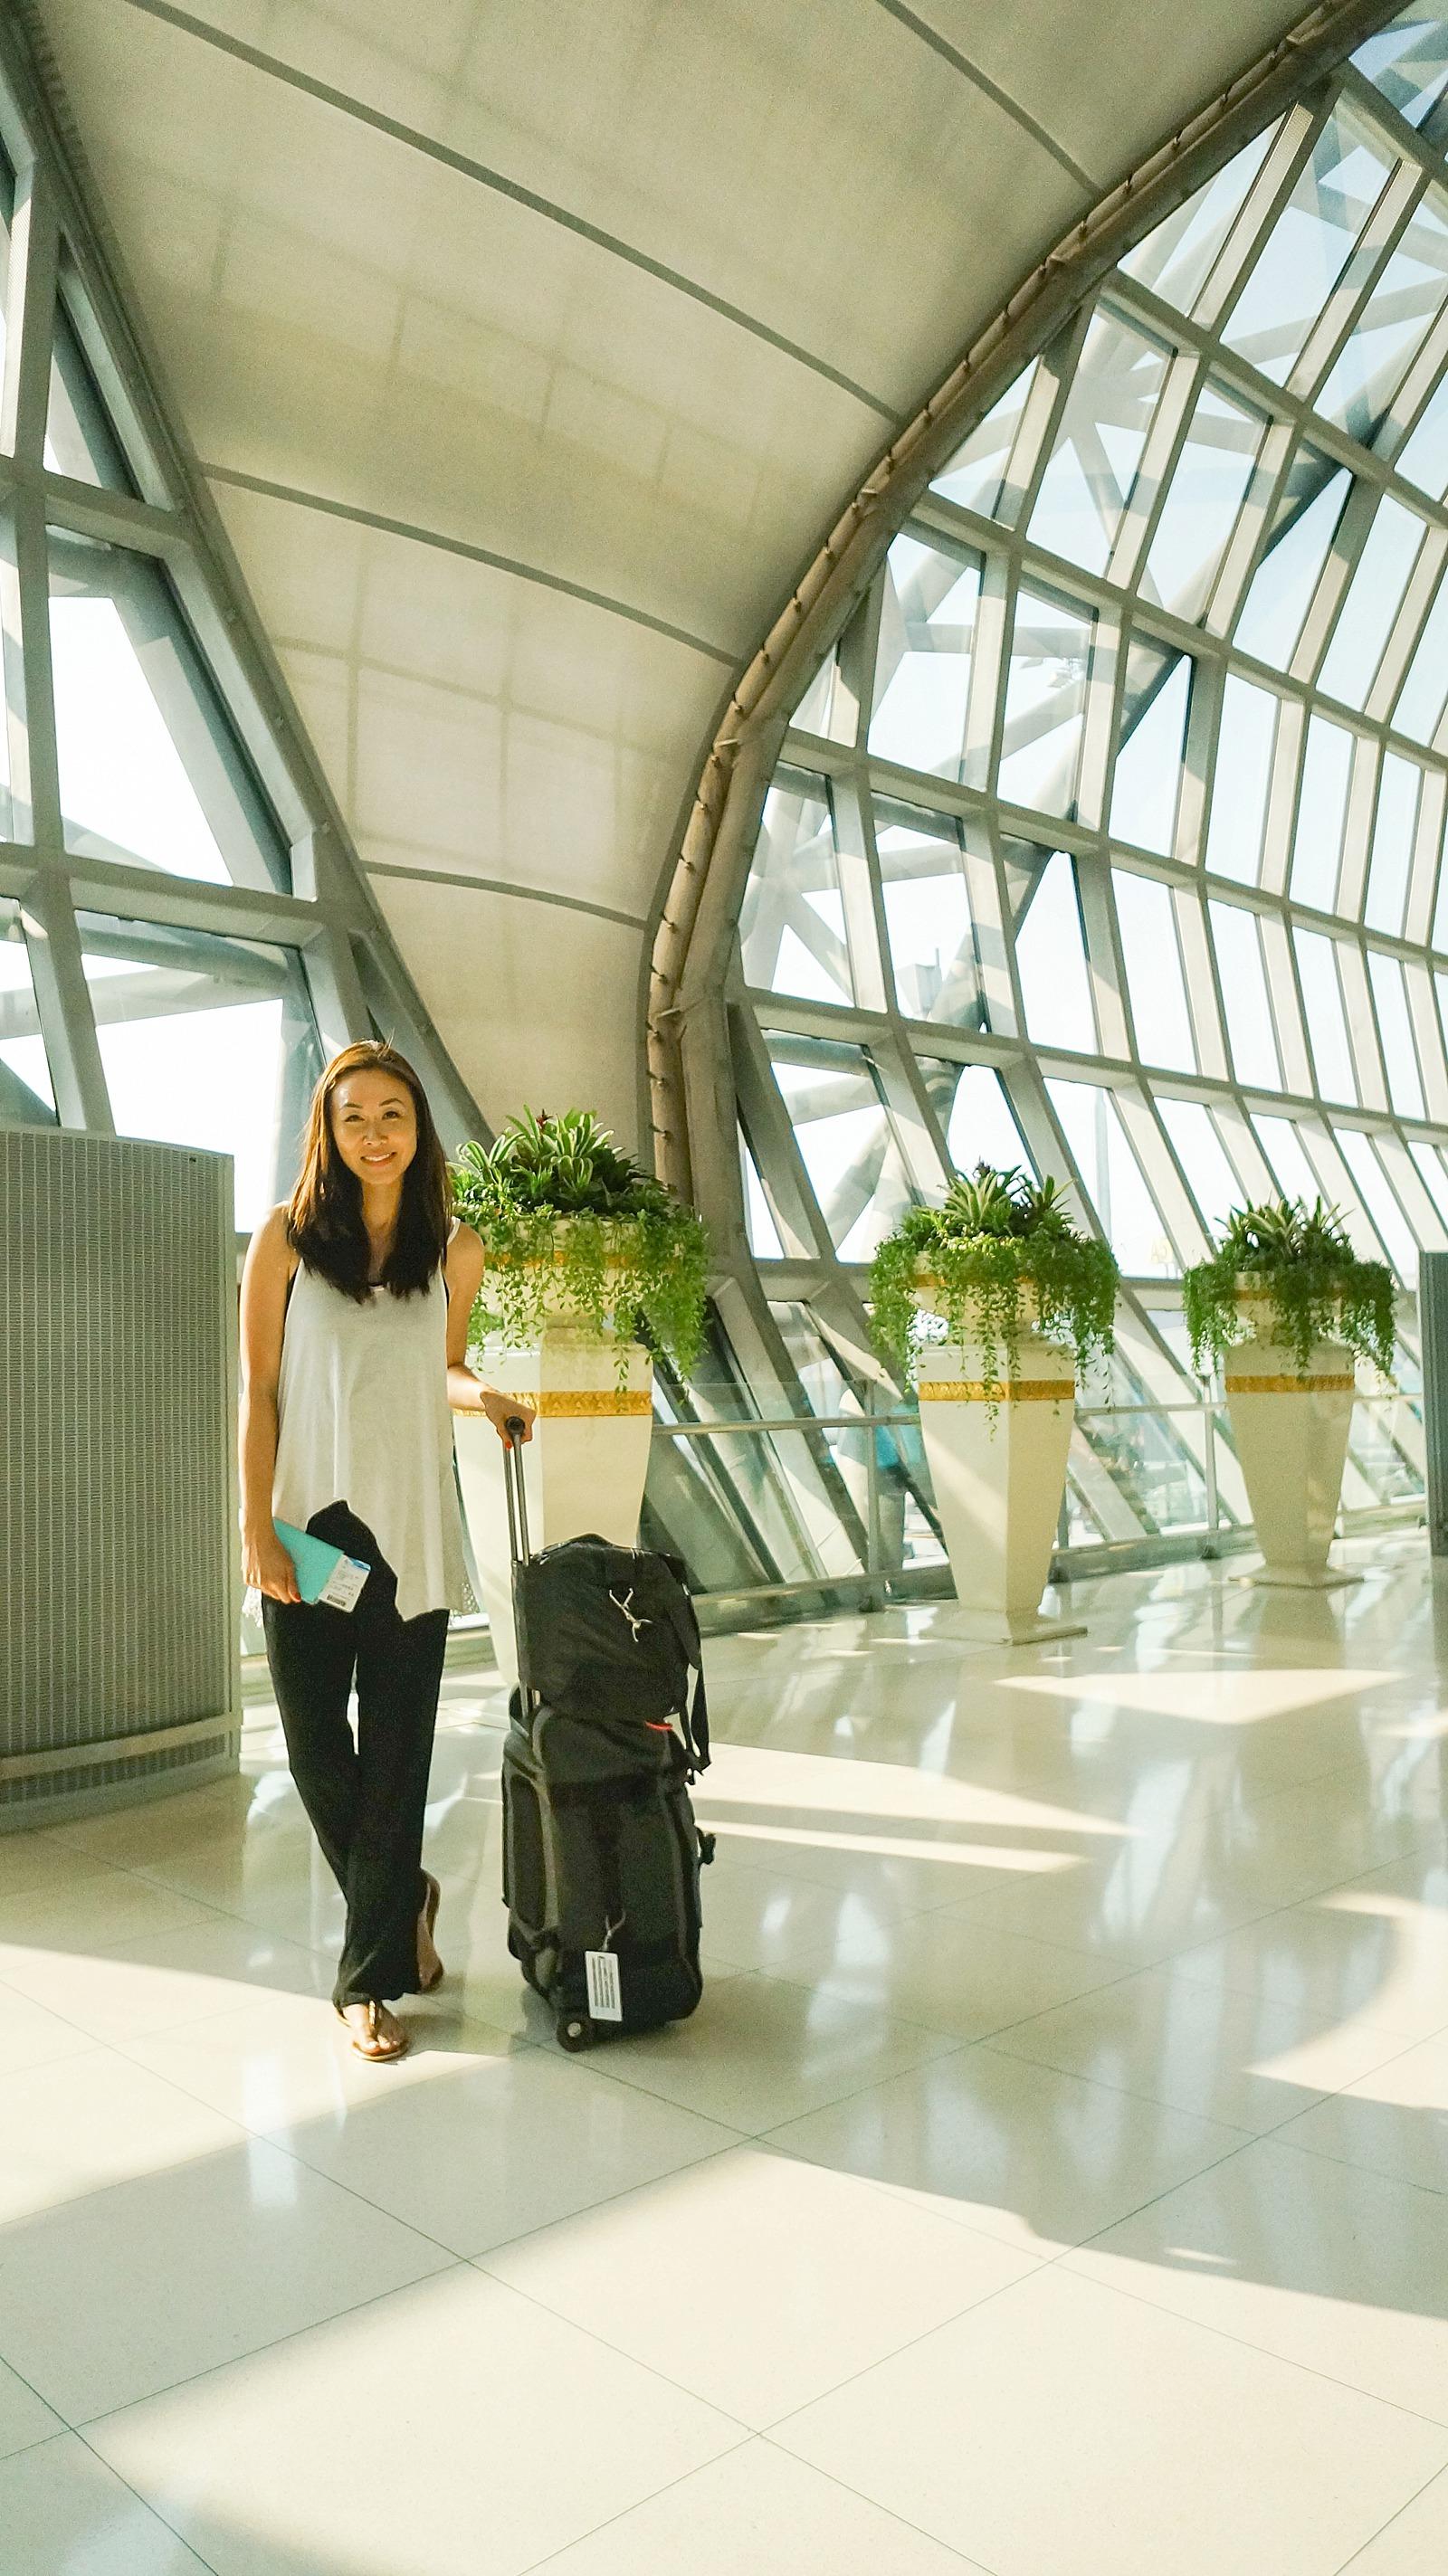 Thailand-diana-elizabeth-travel-blogger-phoenix-365